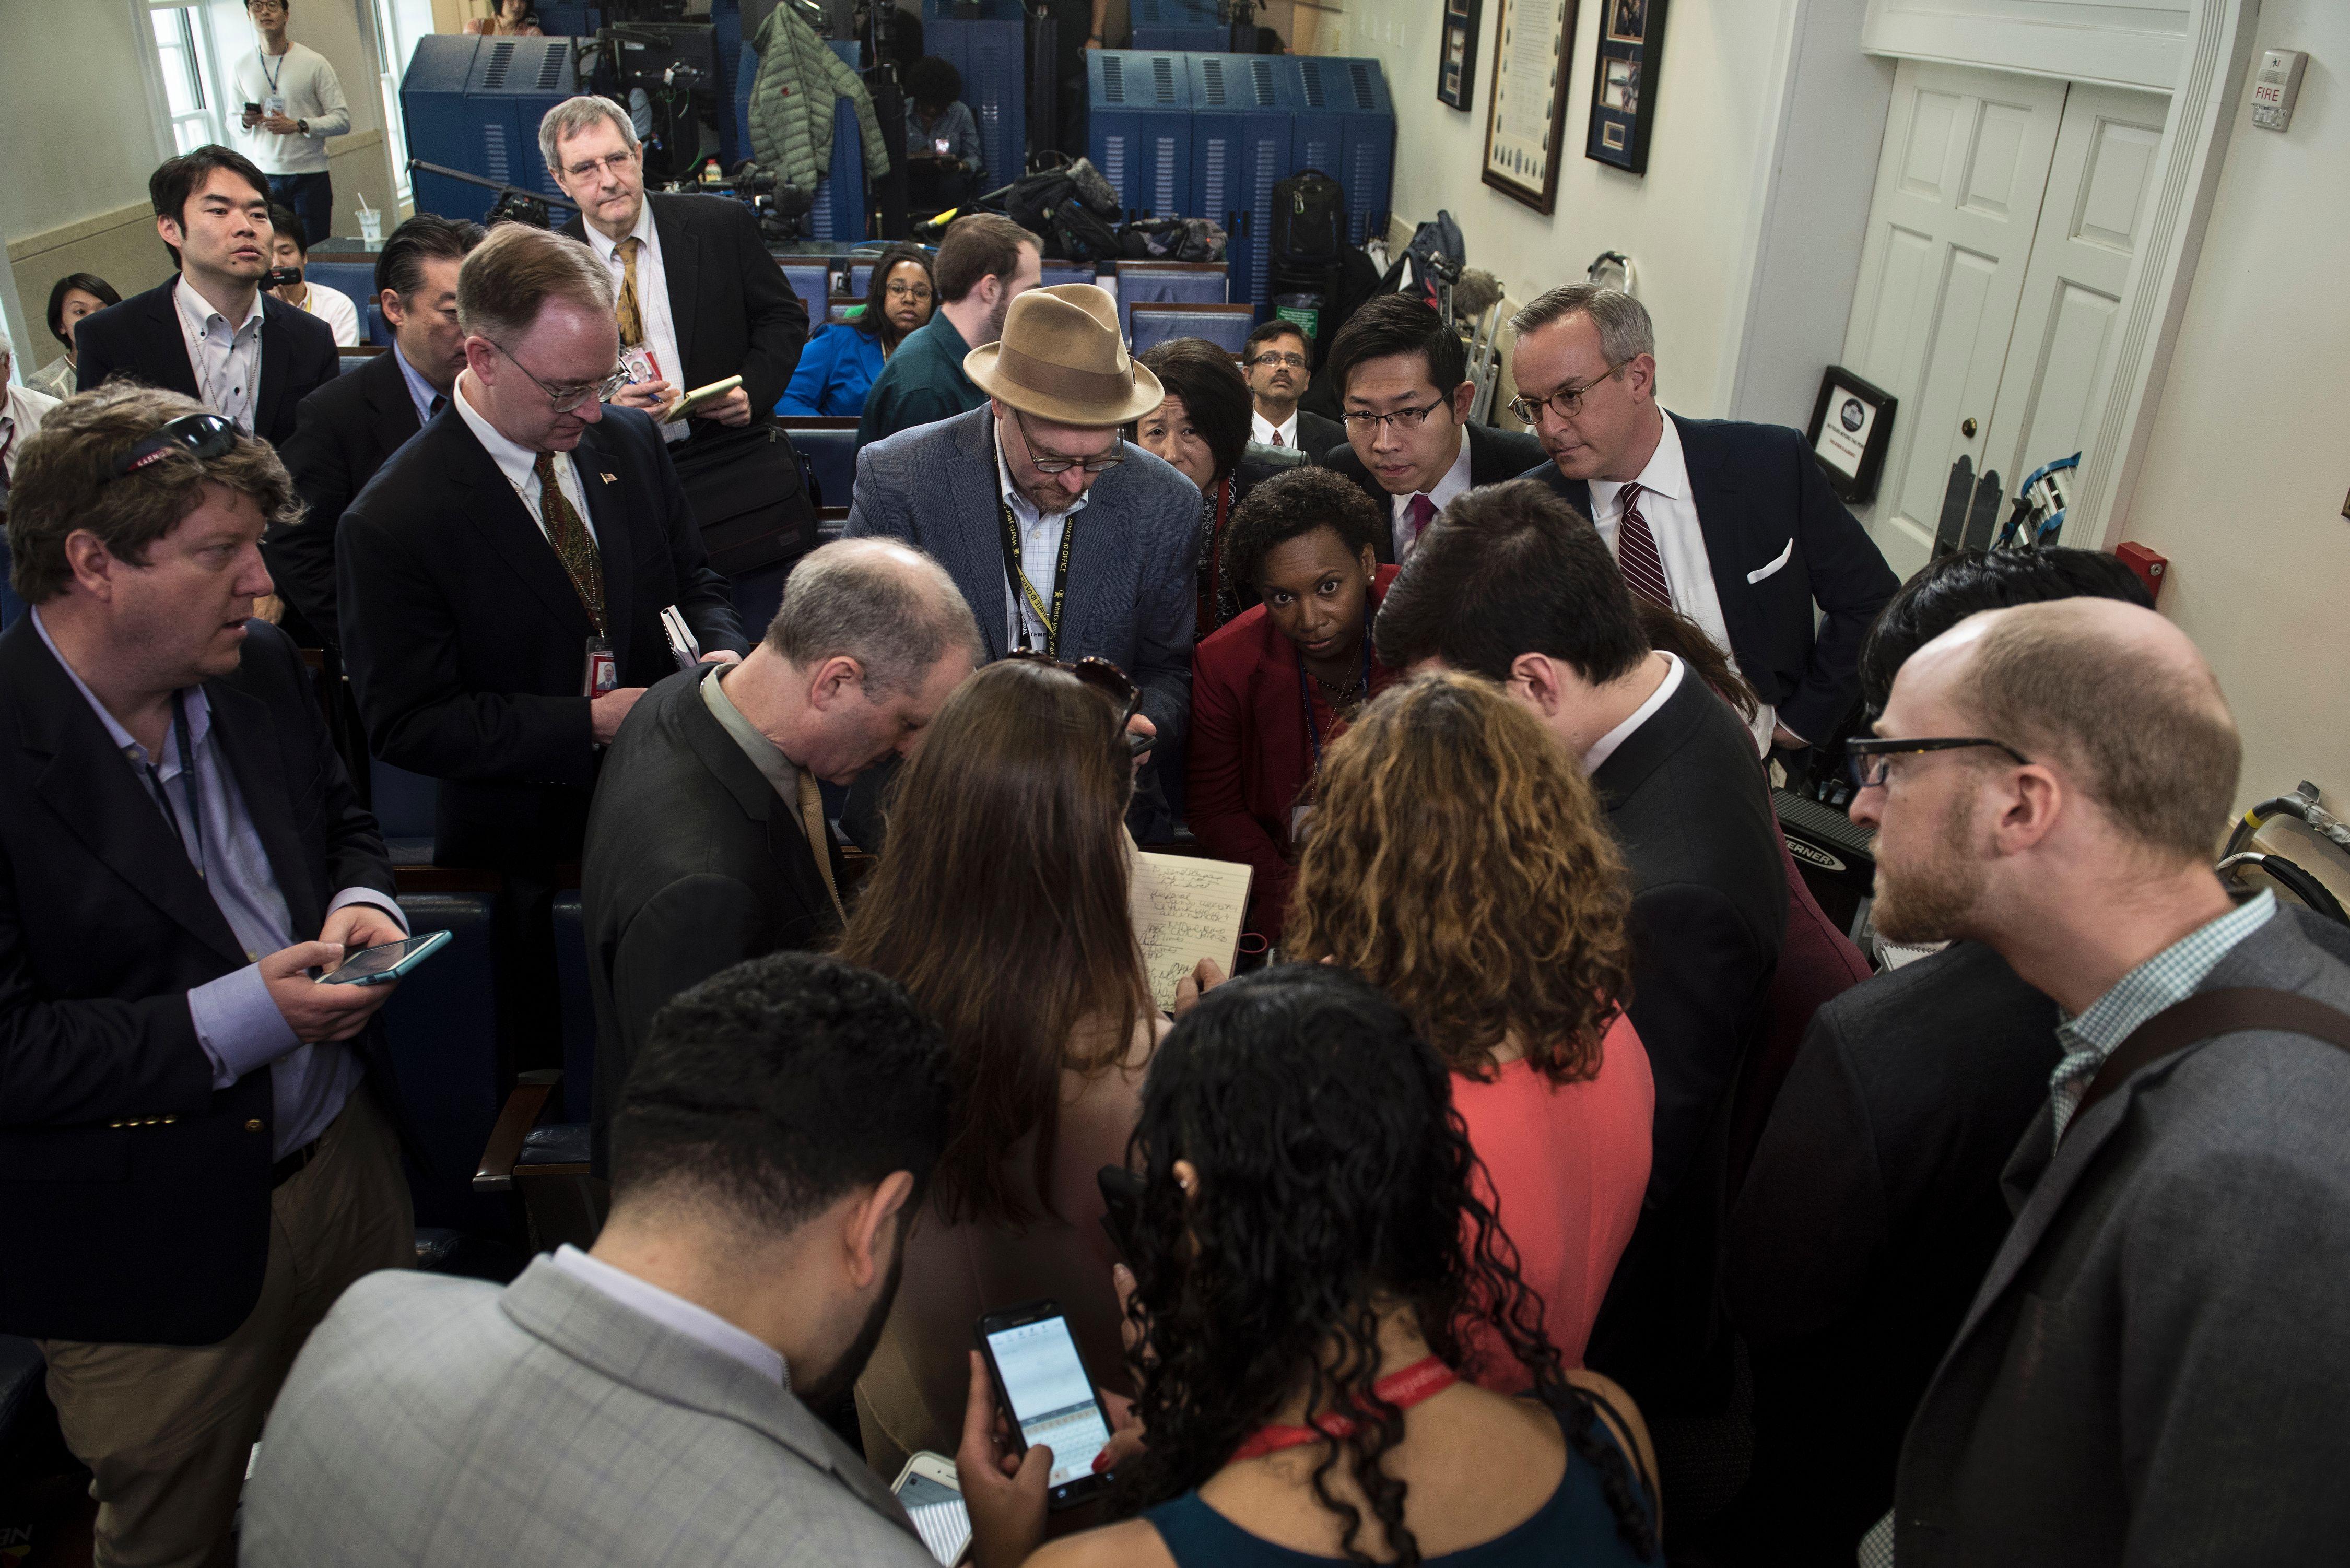 US-POLITICS-MEDIA-BRIEFING